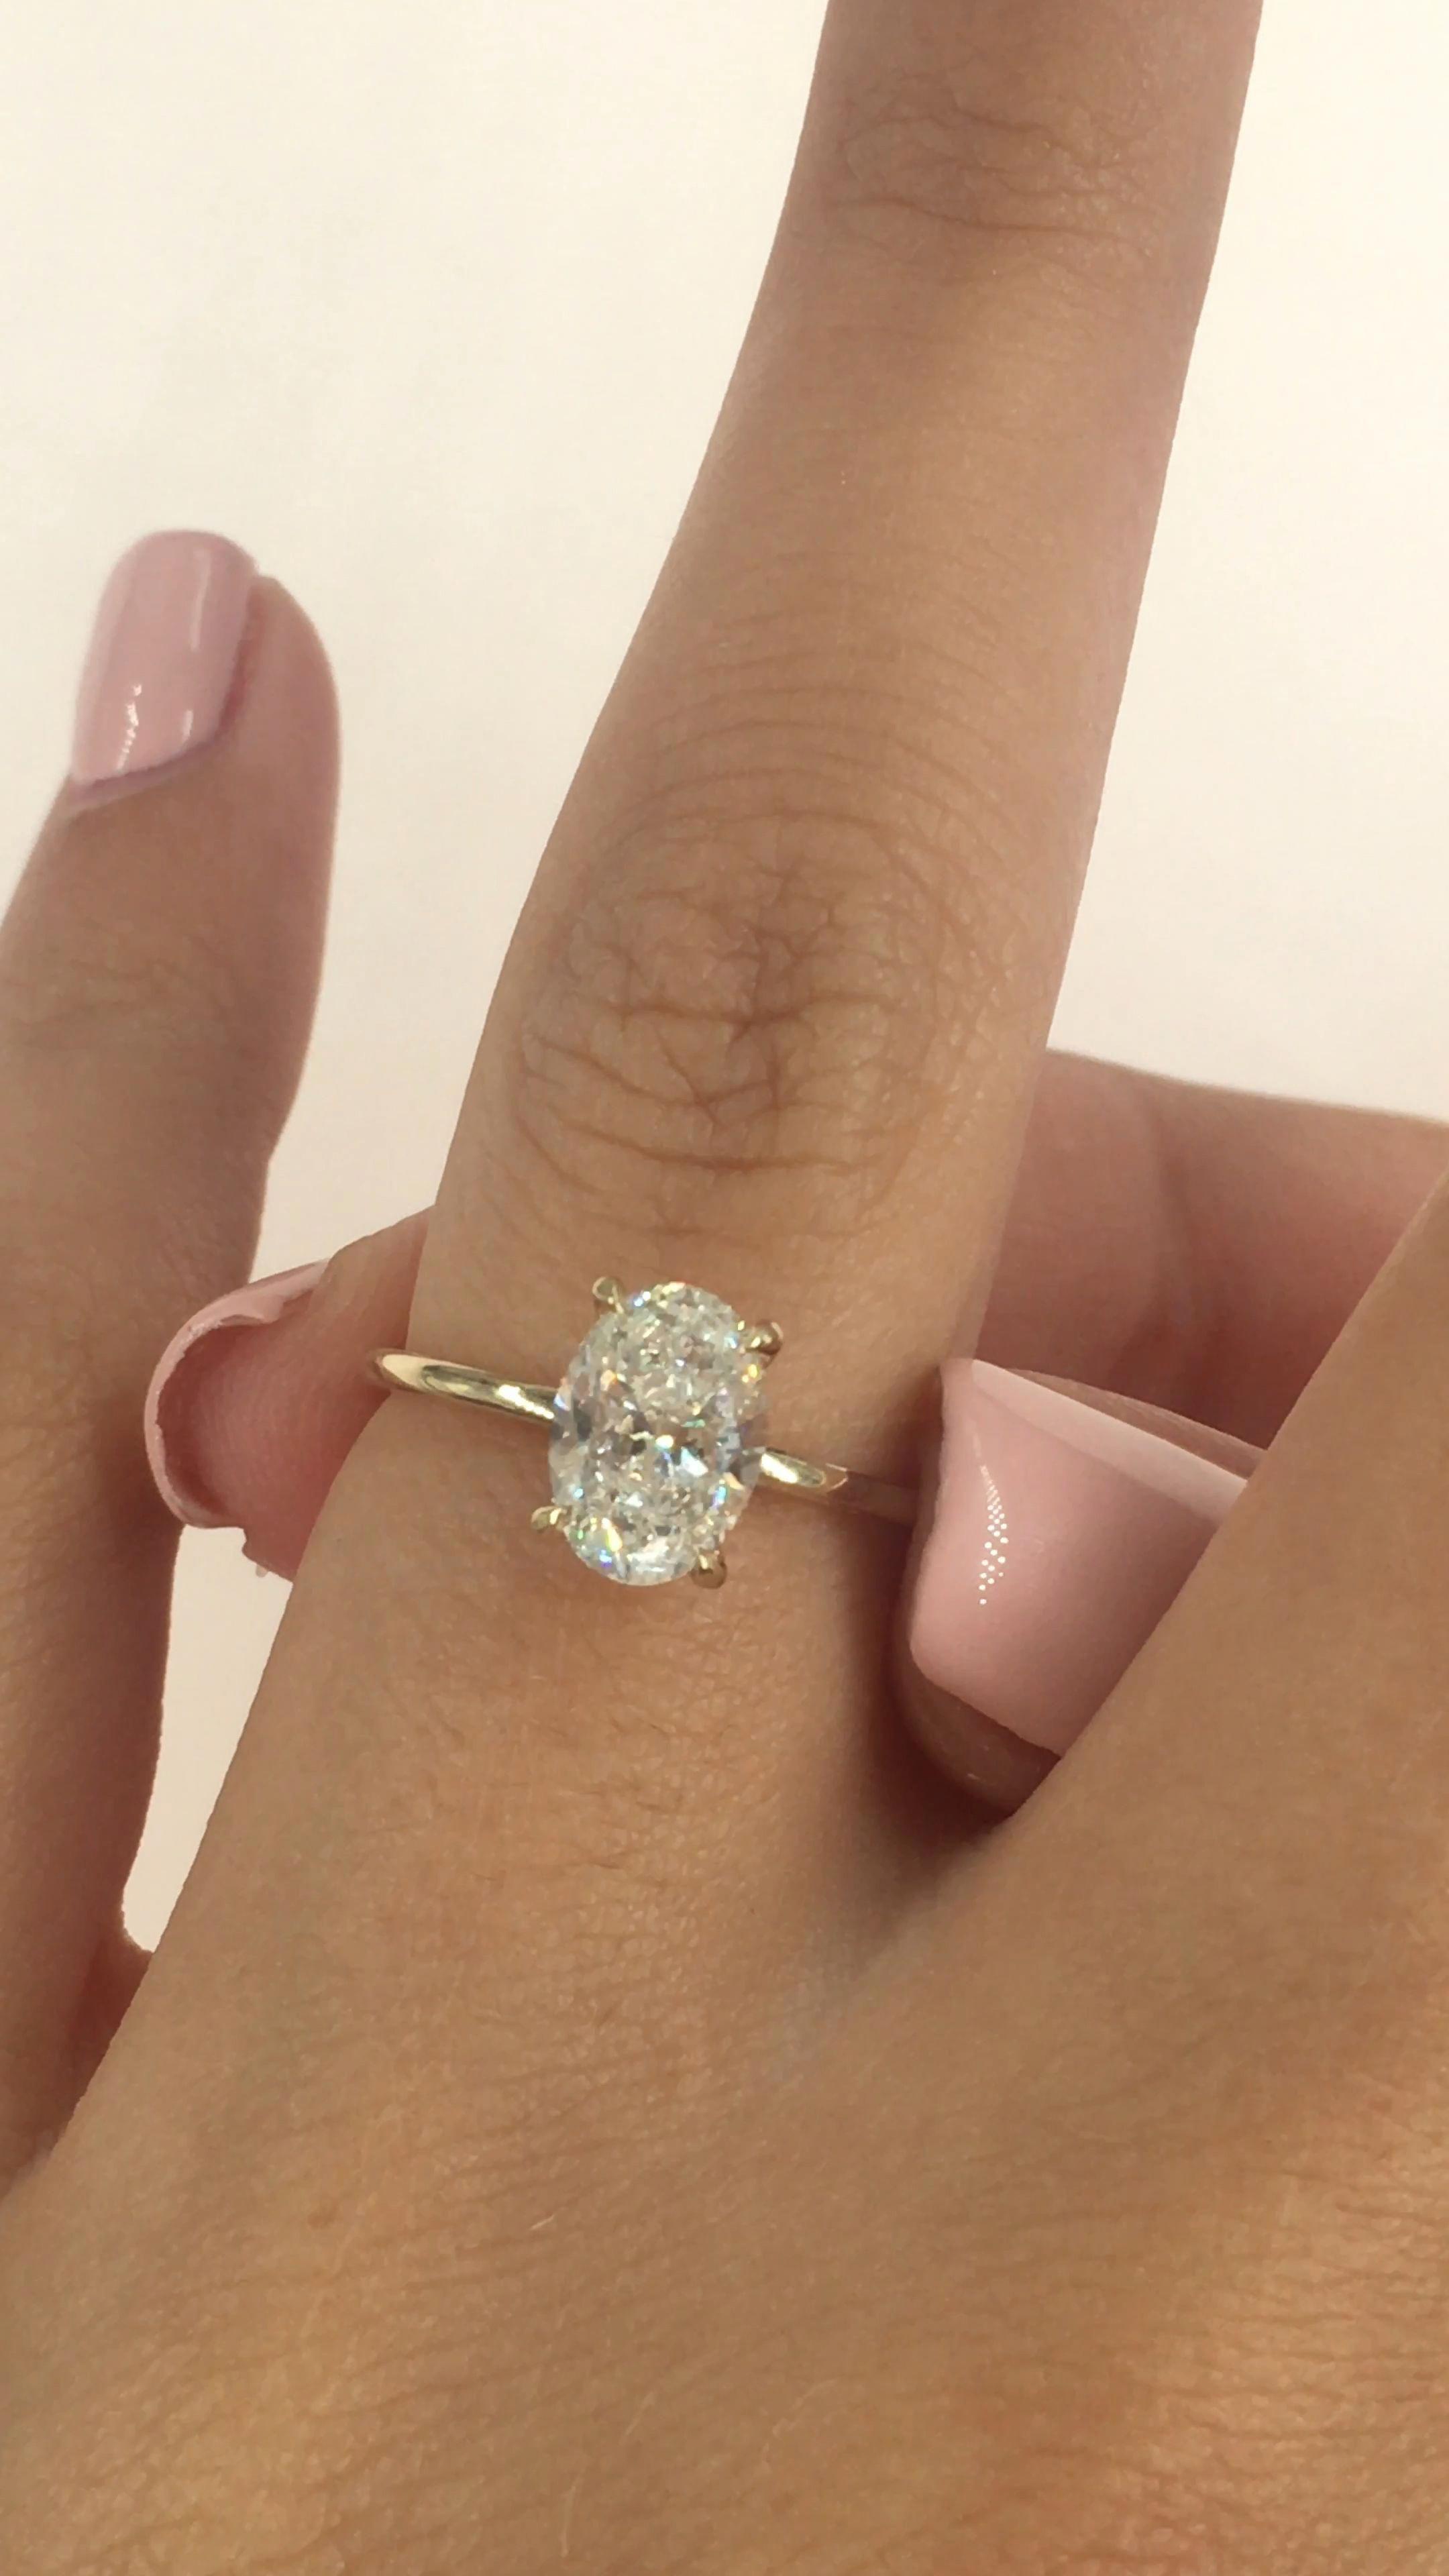 1 Carat Oval Diamond Engagement Ring Hidden Halo 14k Yellow Gold Diamond Ring Oval Diamond Ring Solitaire Diamond Ring Engagement Ring In 2020 Oval Diamond Engagement Ring Engagement Rings Oval Diamond Ring